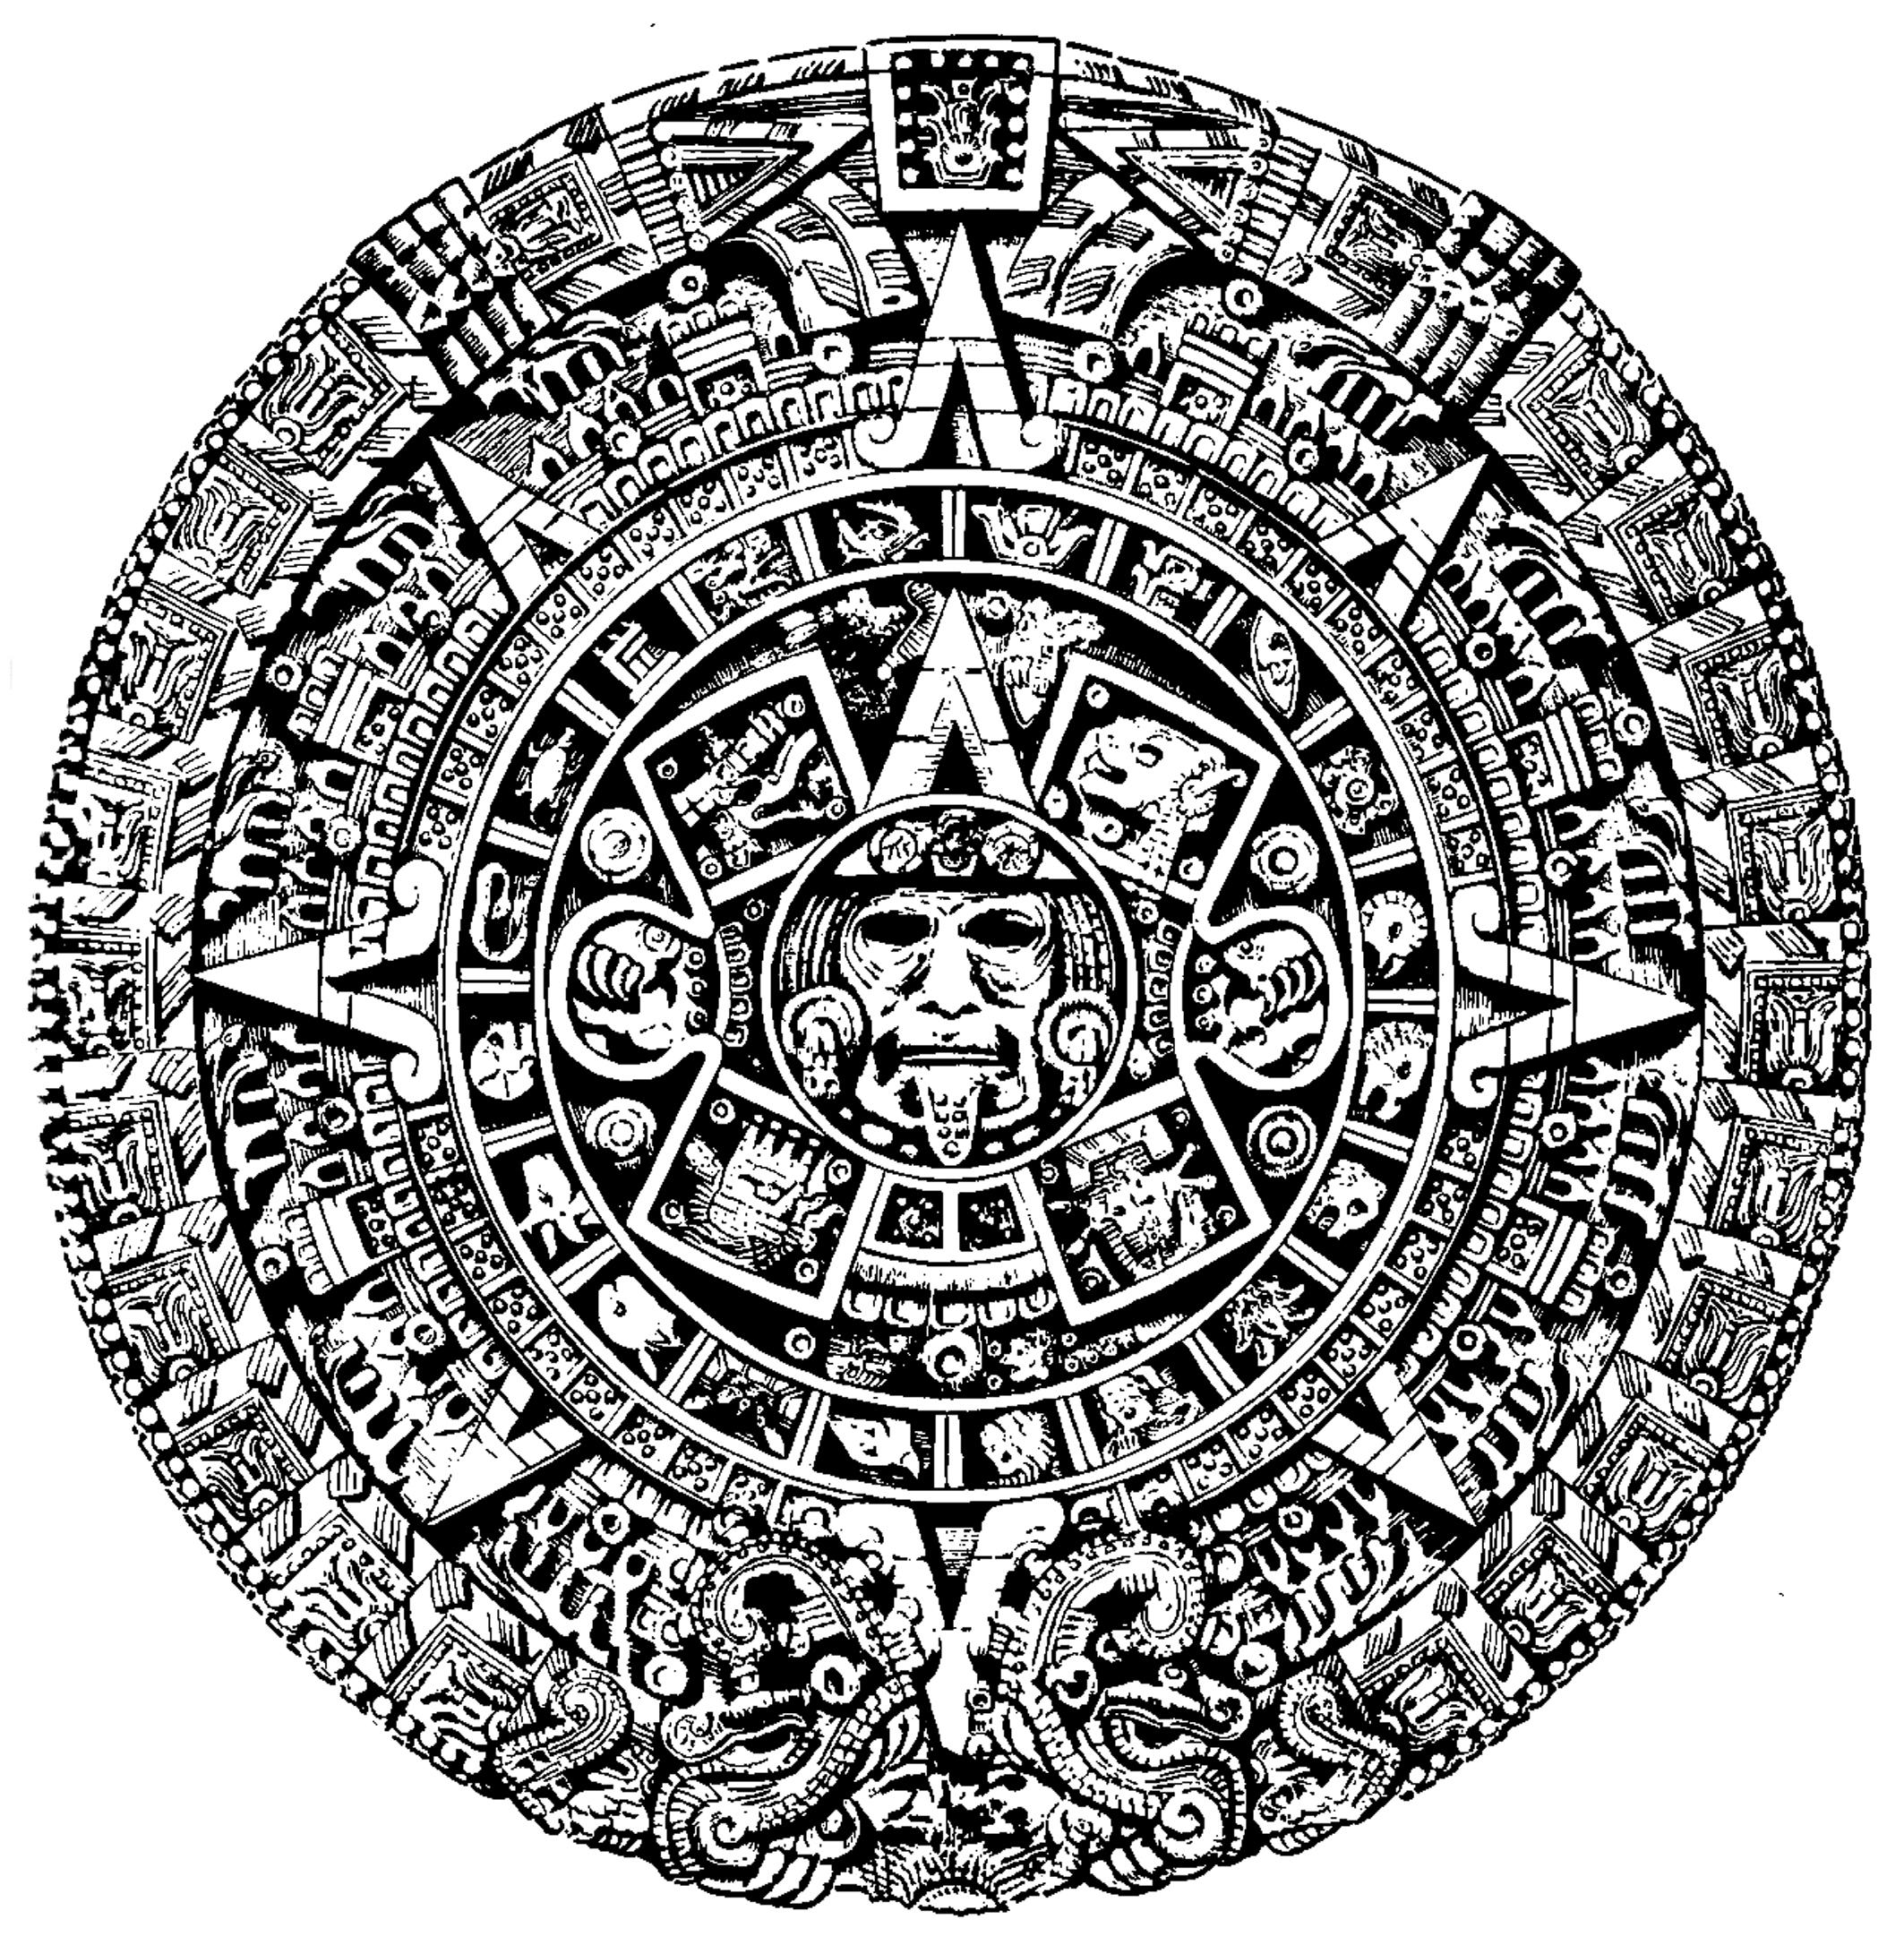 Mexican Calendar Art : Mexican calendar by louboumian on deviantart